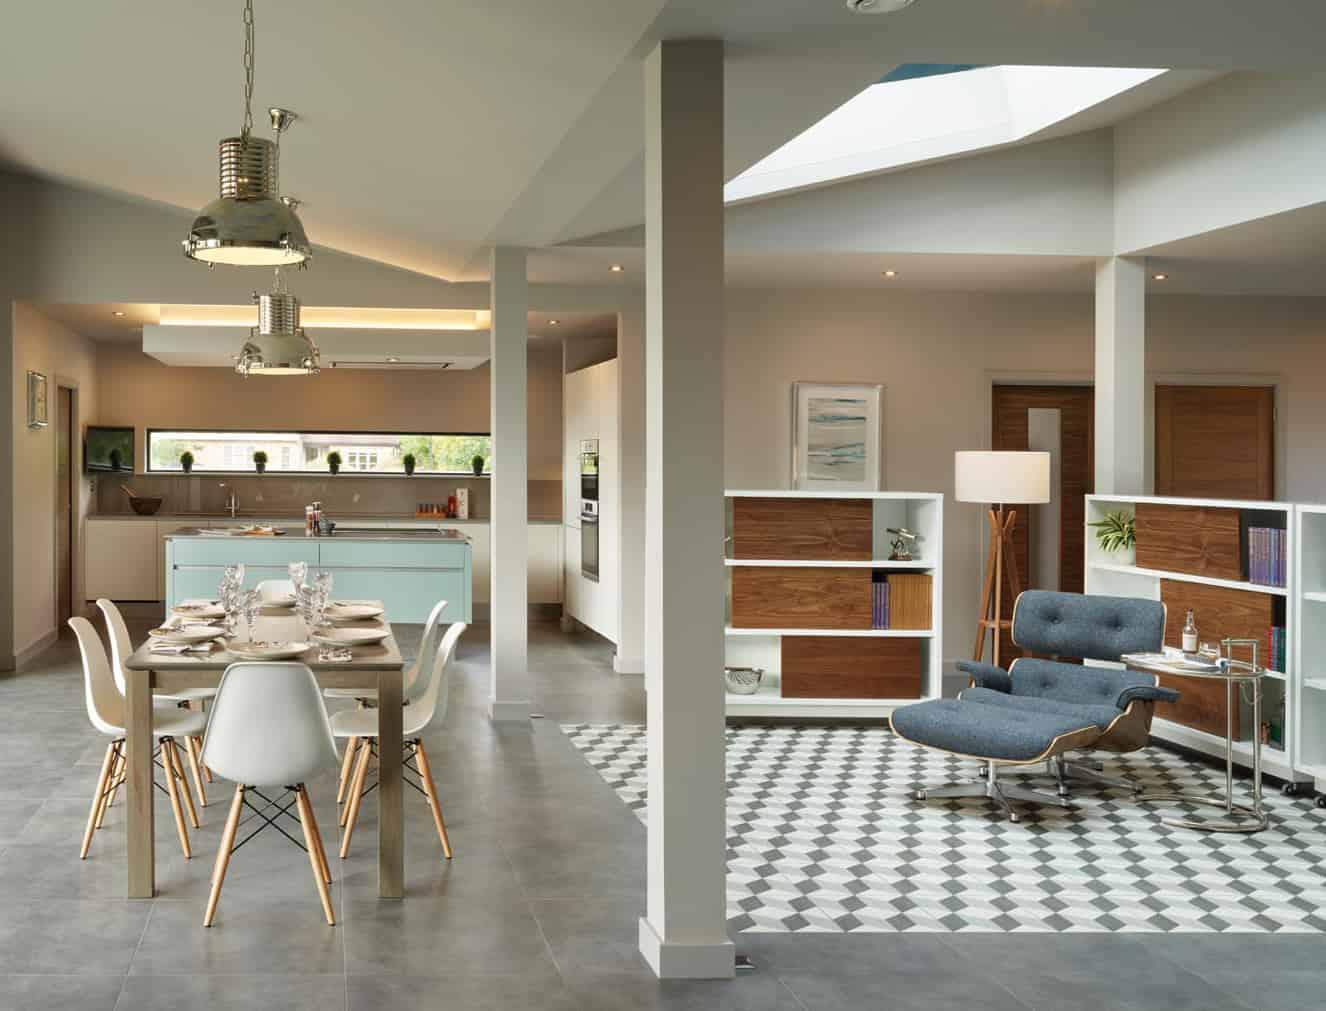 home design consultant oxfordshire j\u0026s house of designHouse Design Cub #21